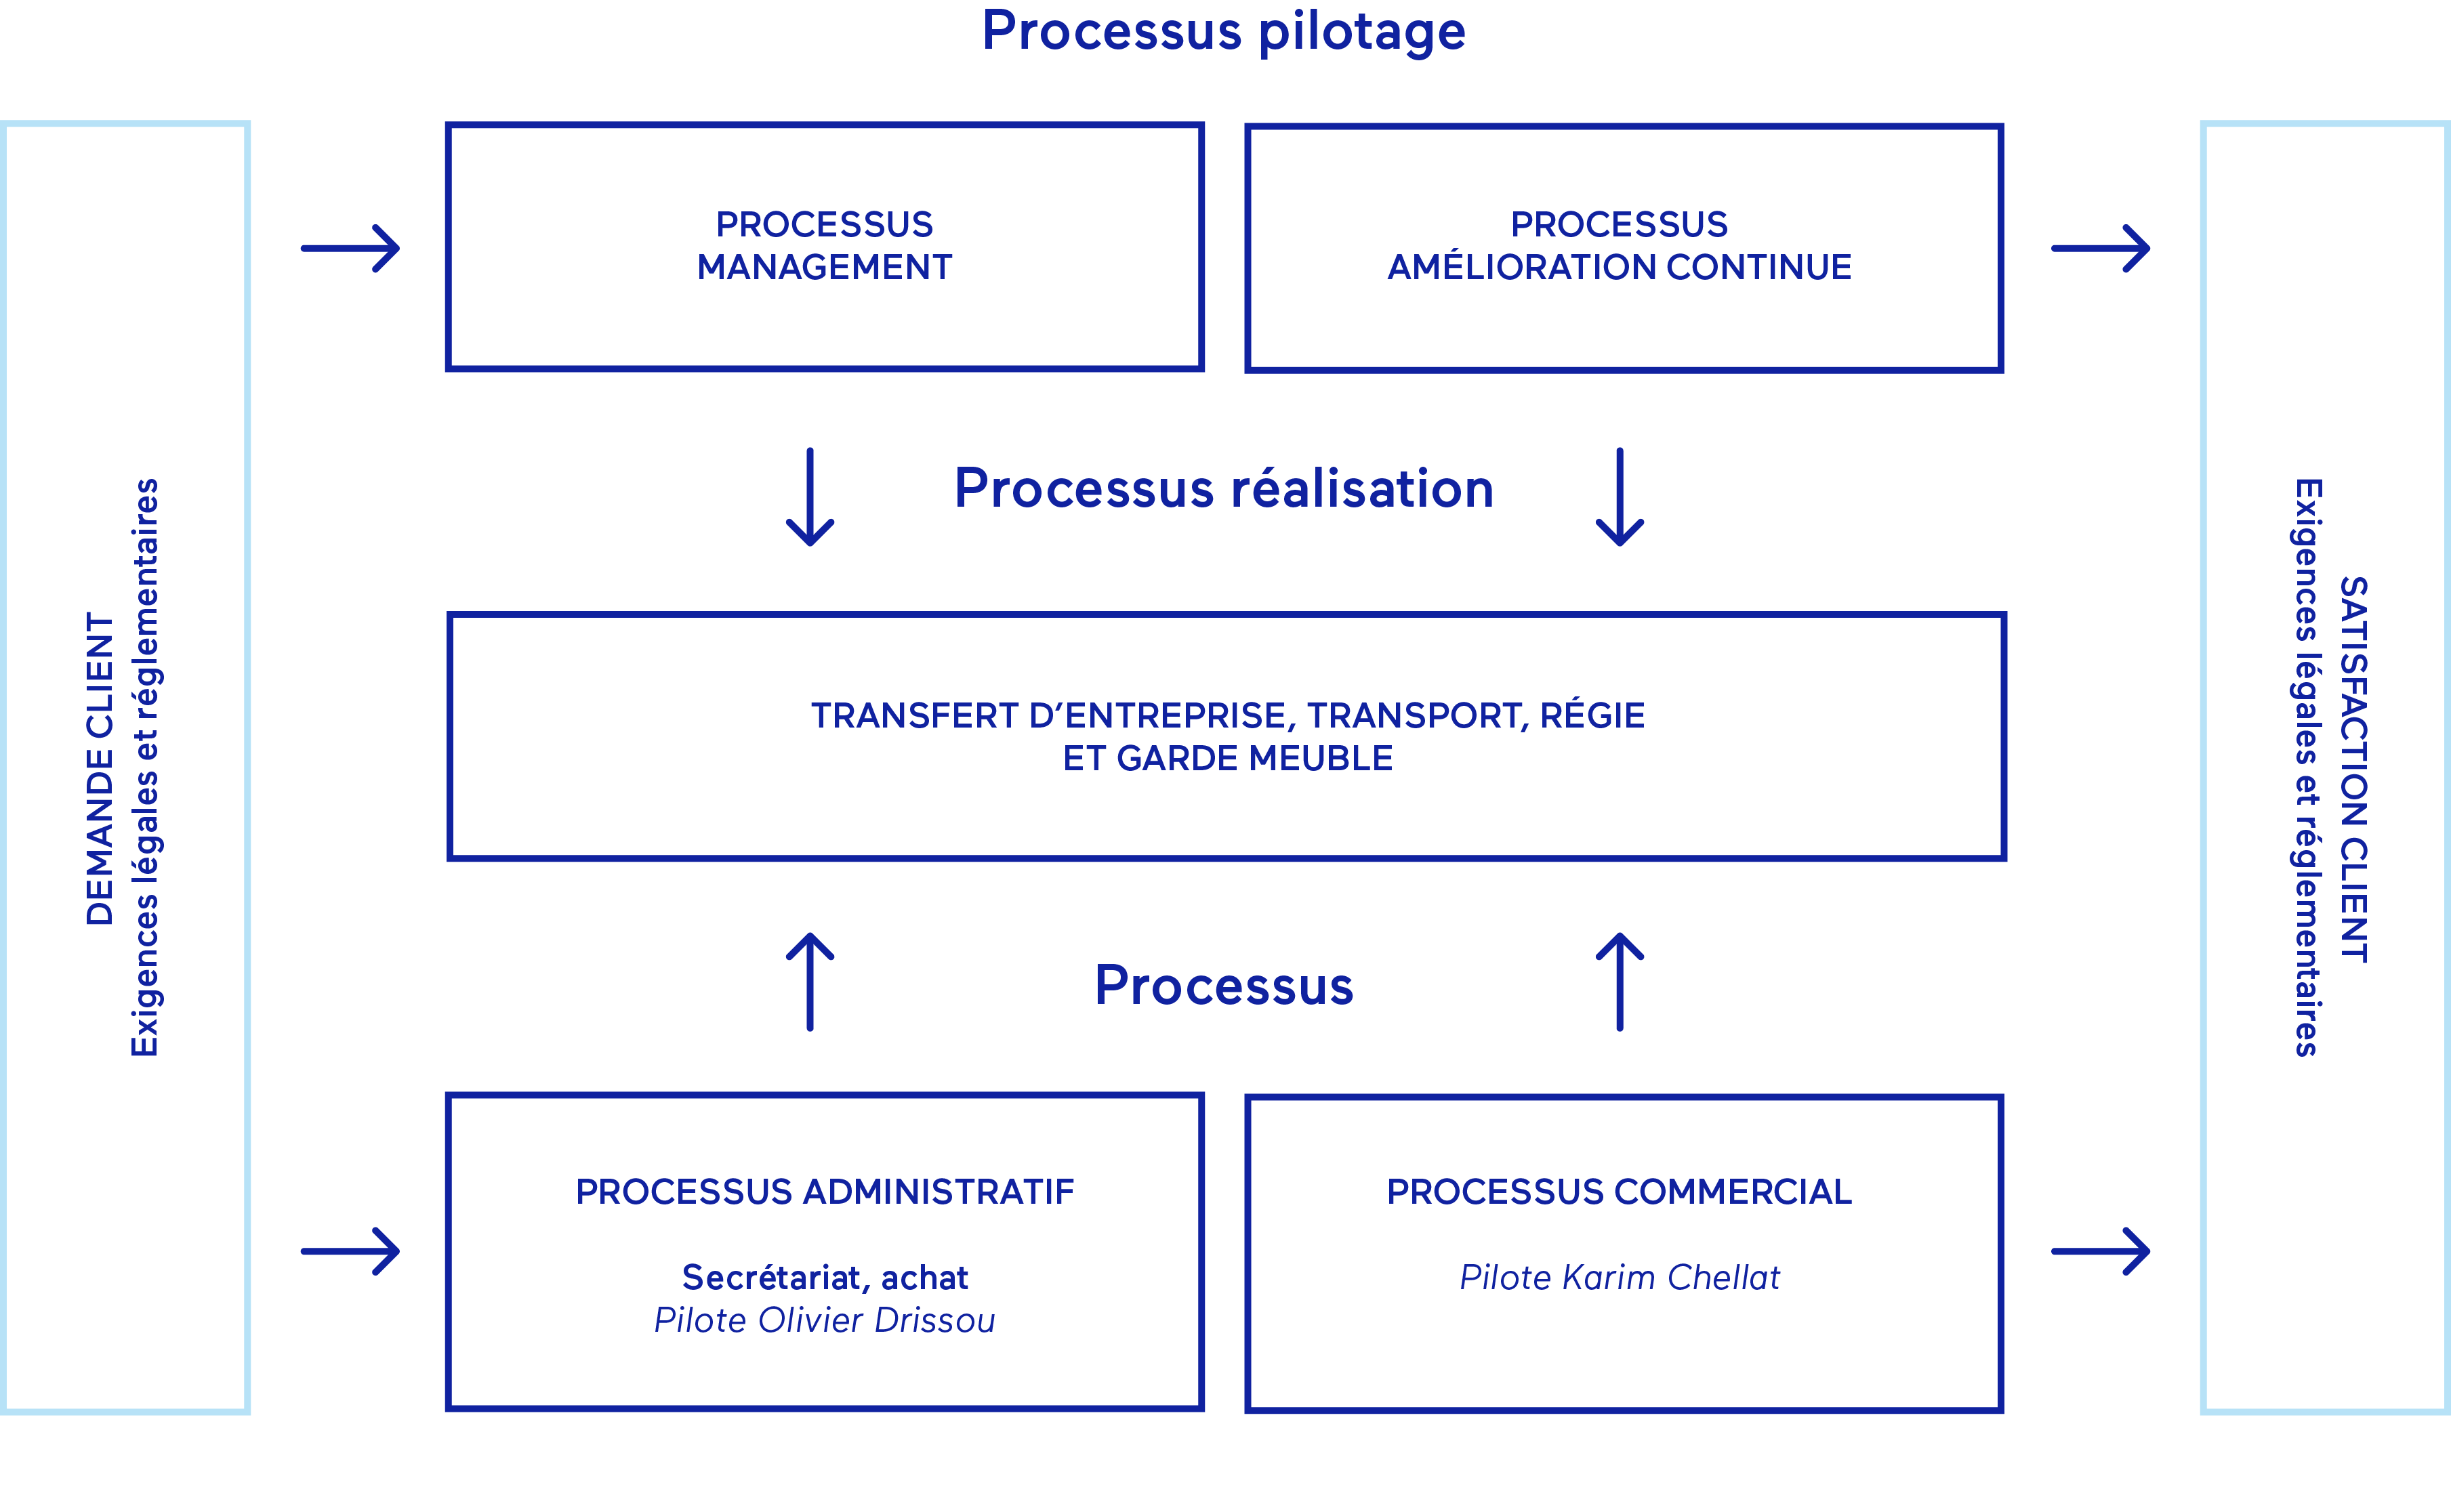 processus shema